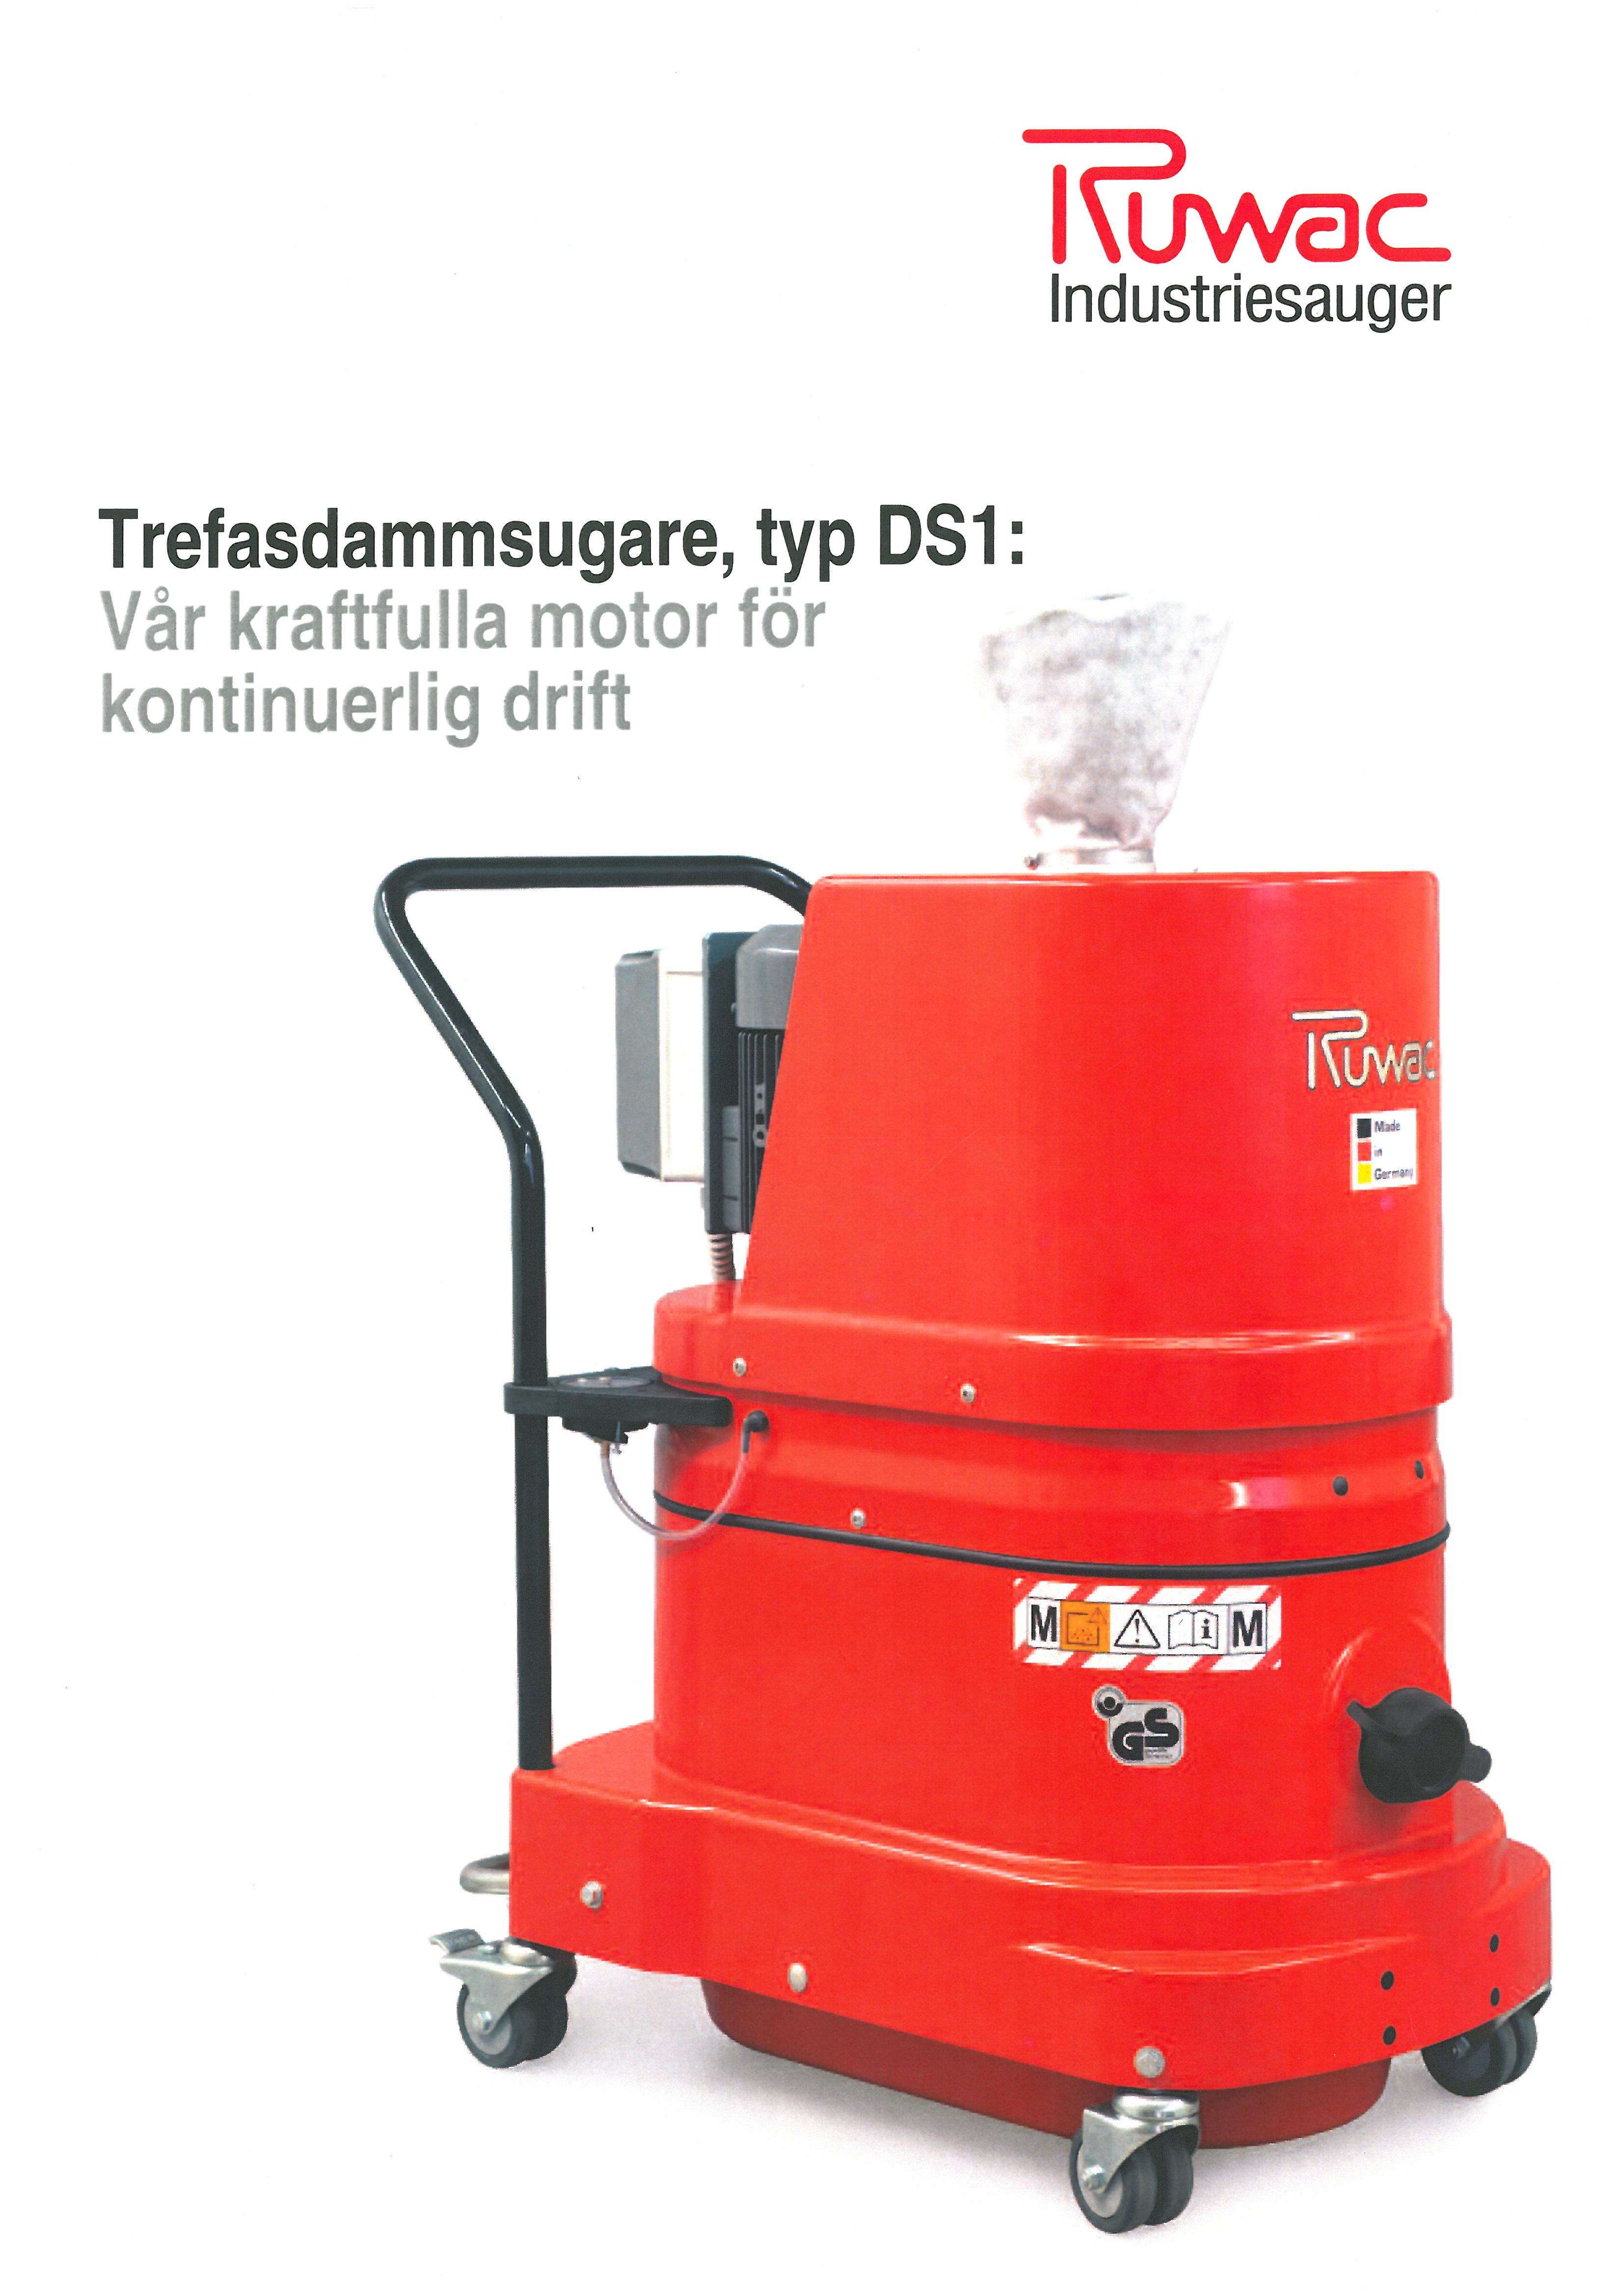 Explosionssäker ATEX II dammsugare industritorget.se